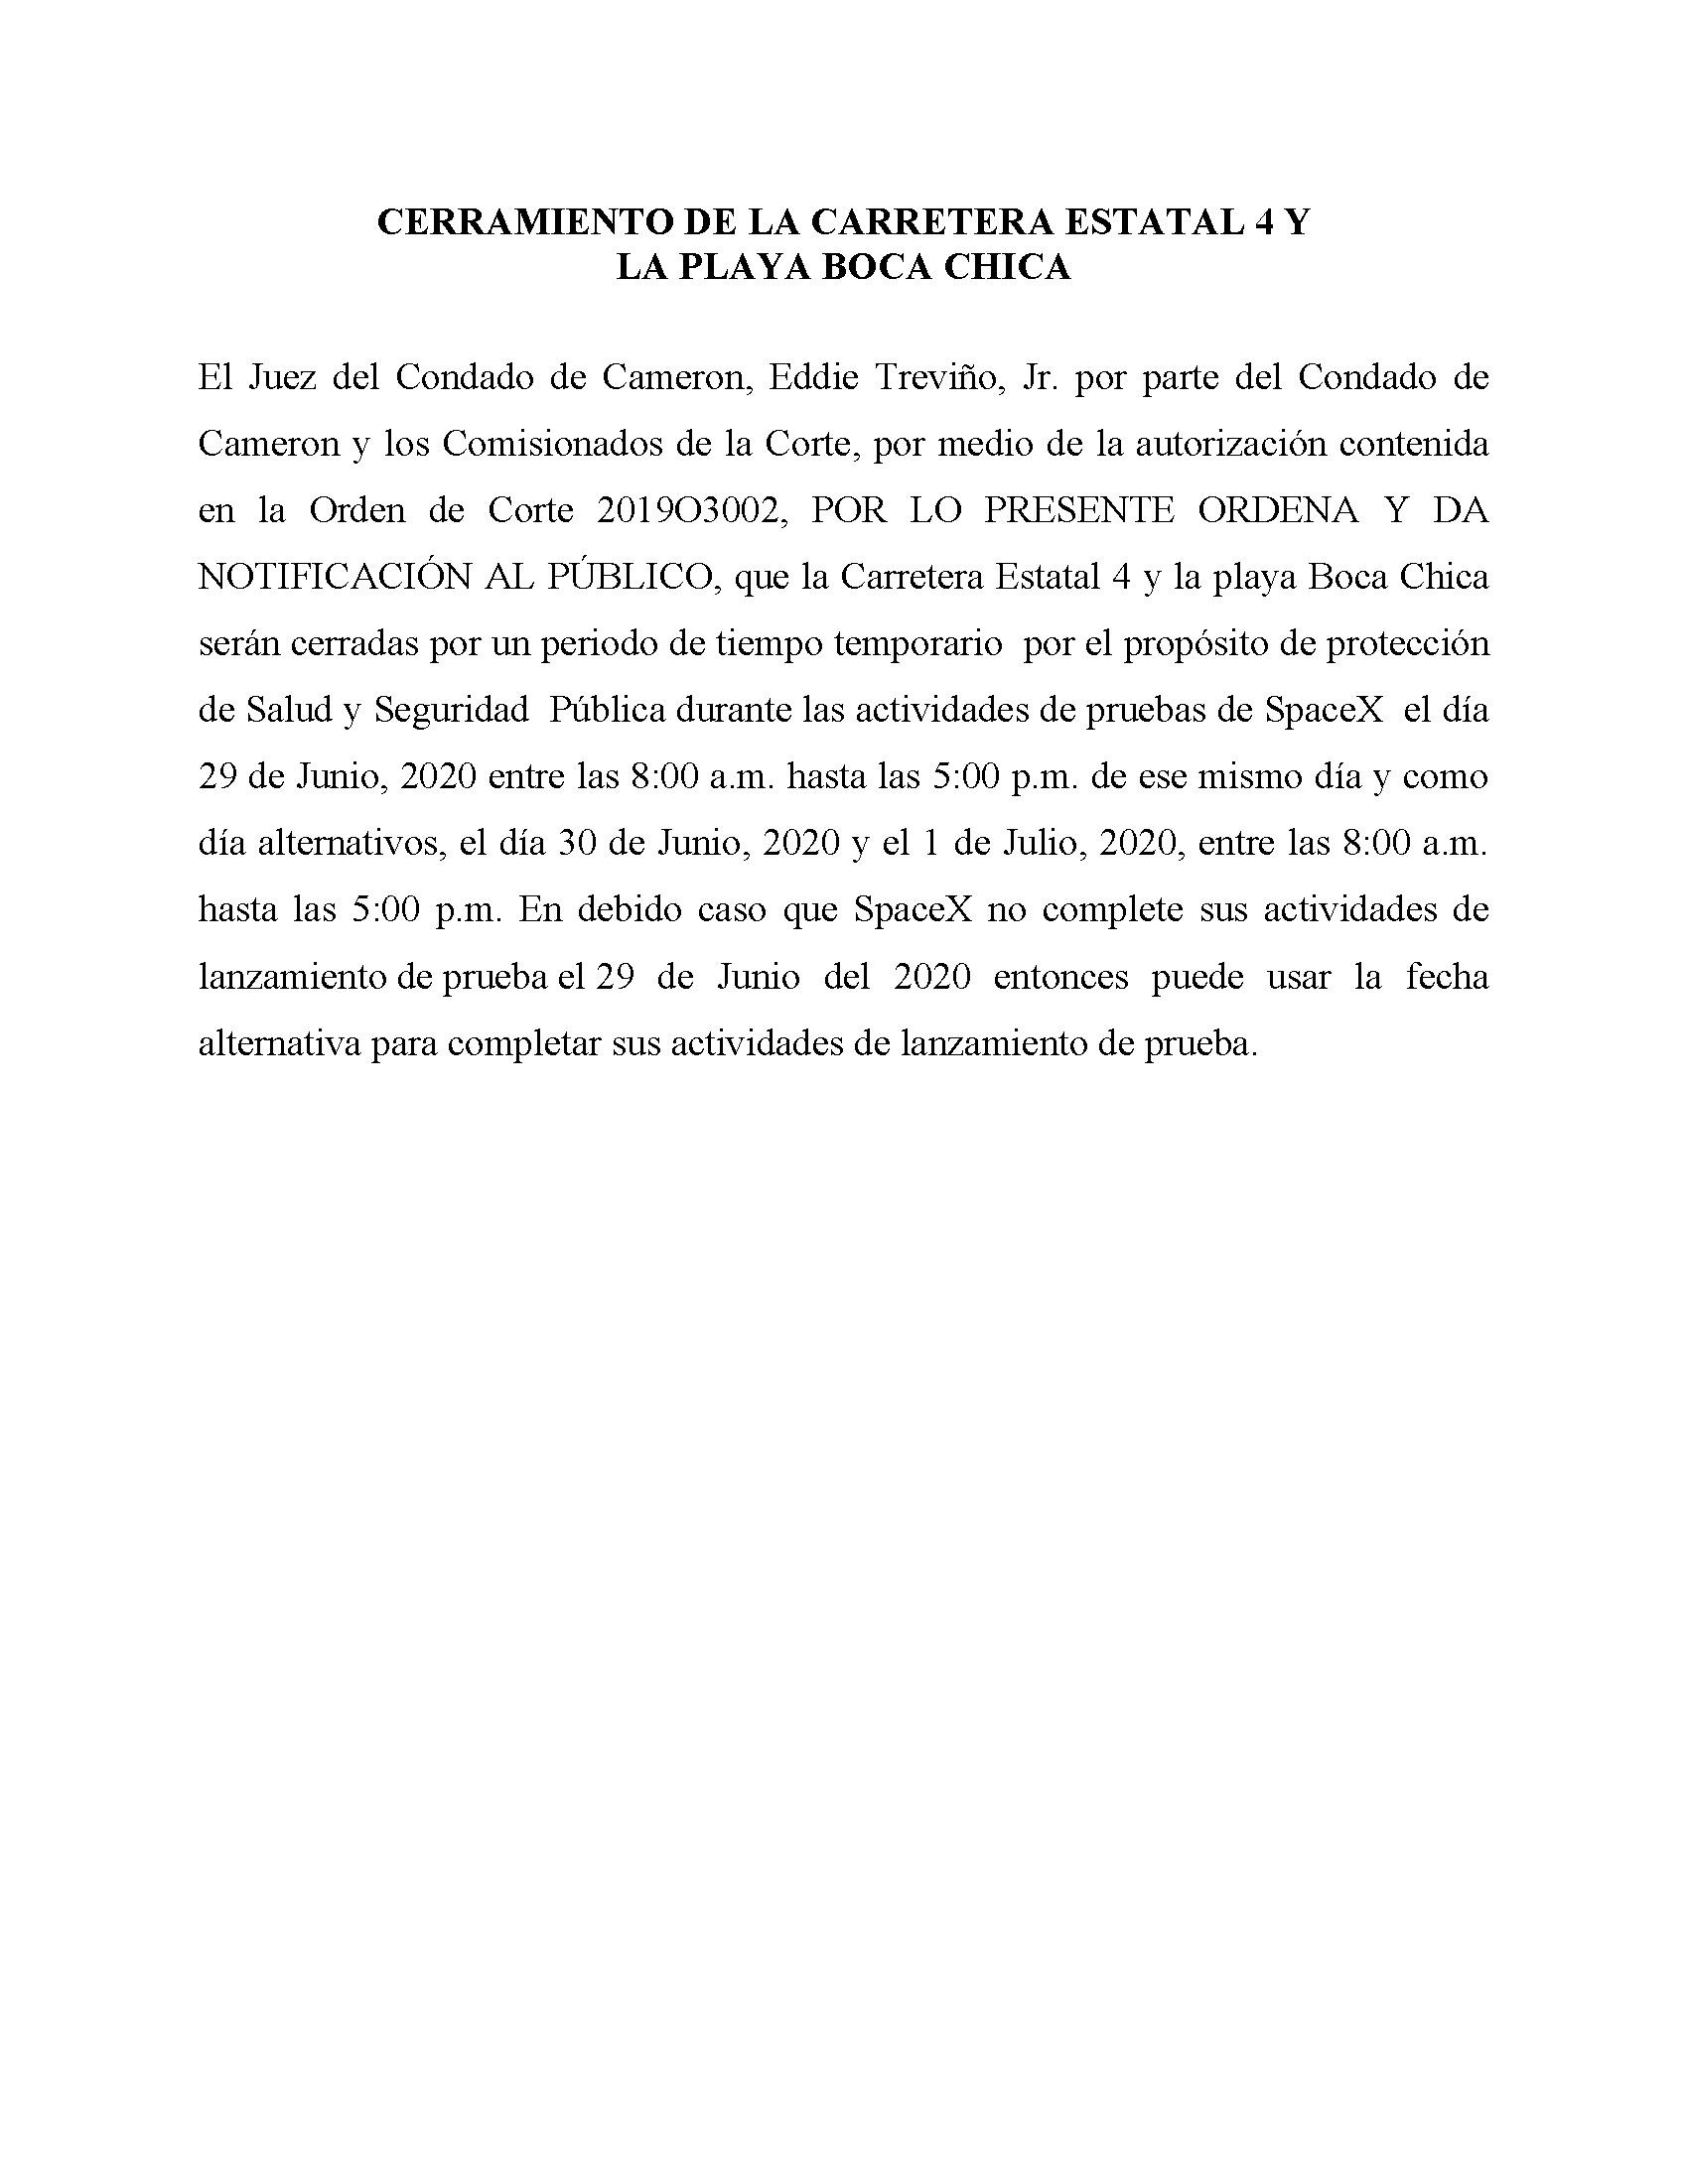 ORDER.CLOSURE OF HIGHWAY 4 Y LA PLAYA BOCA CHICA.SPANISH.06.29.20